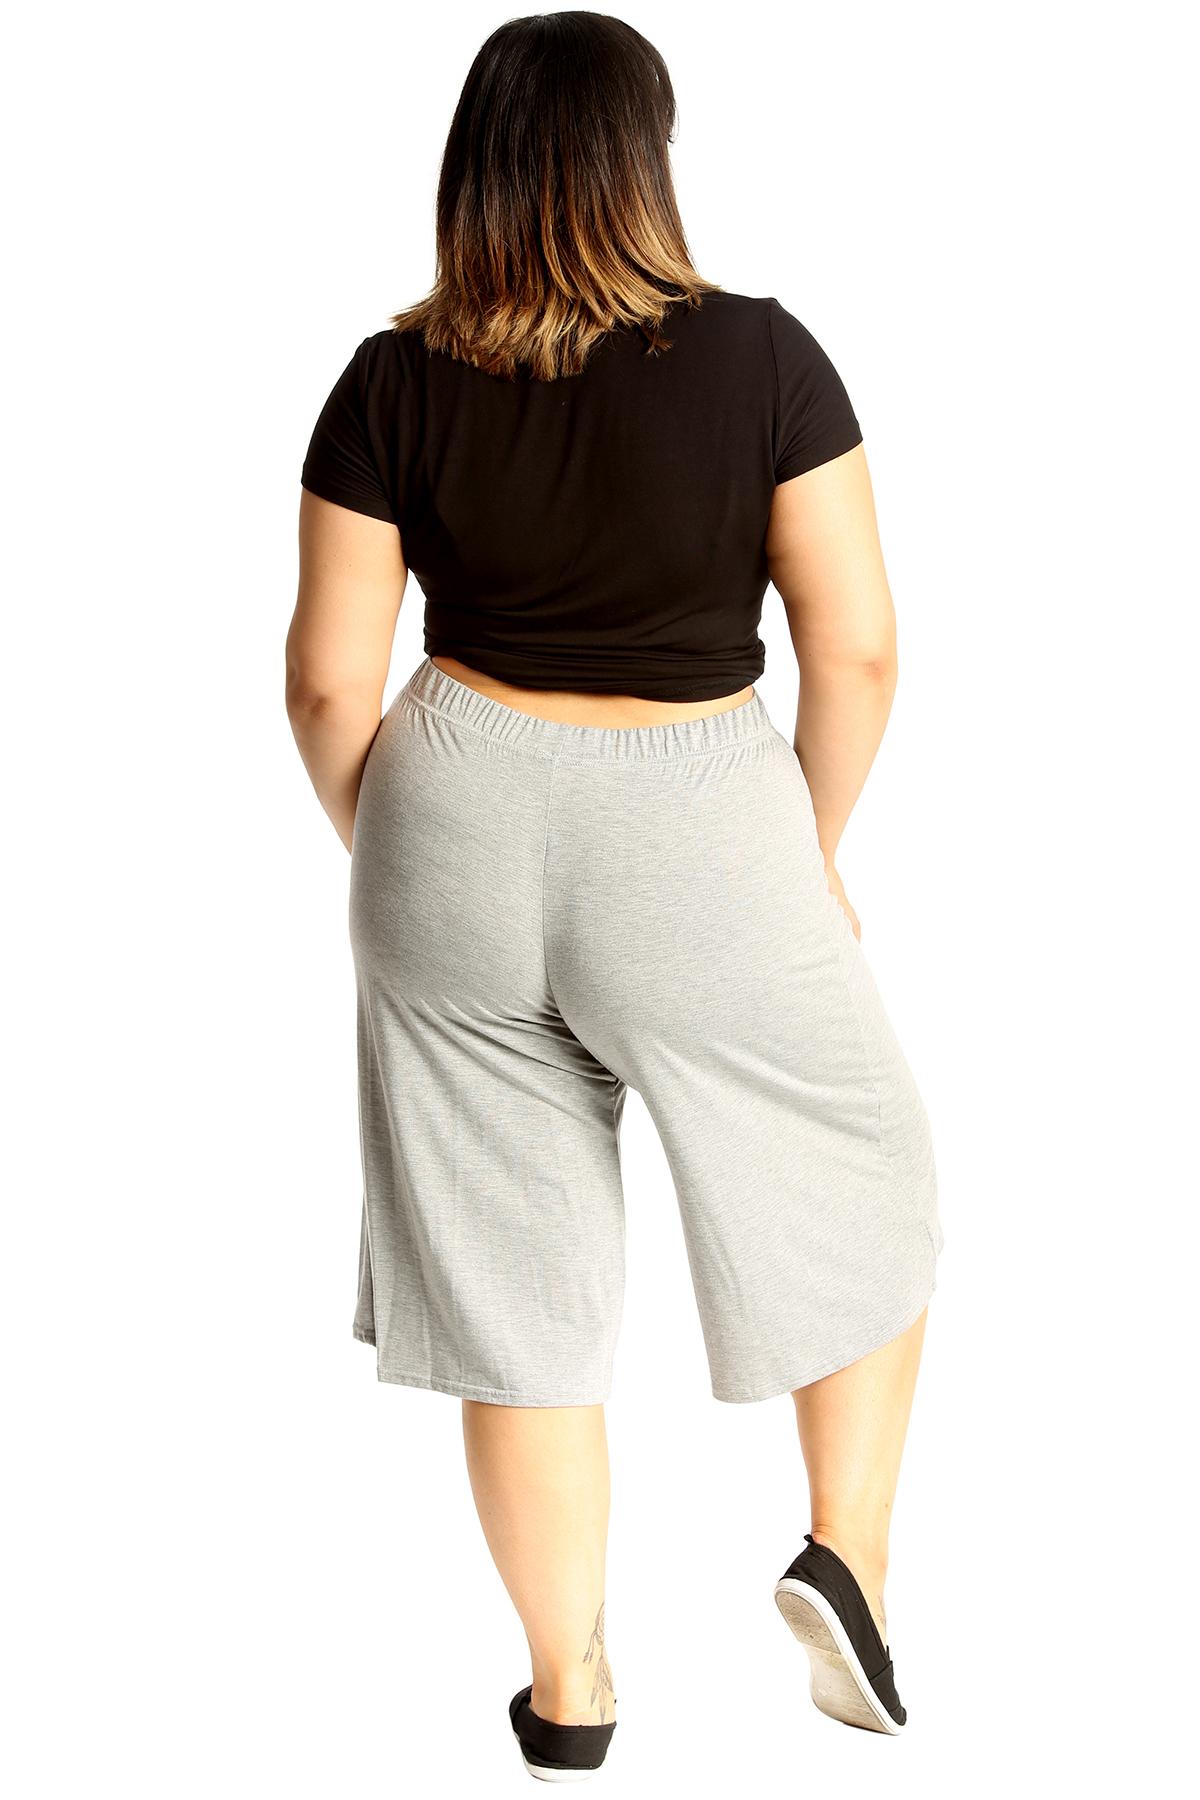 New-Womens-Plus-Size-Culottes-Ladies-Plain-Shorts-Palazzo-Elastic-Pants-Summer thumbnail 24